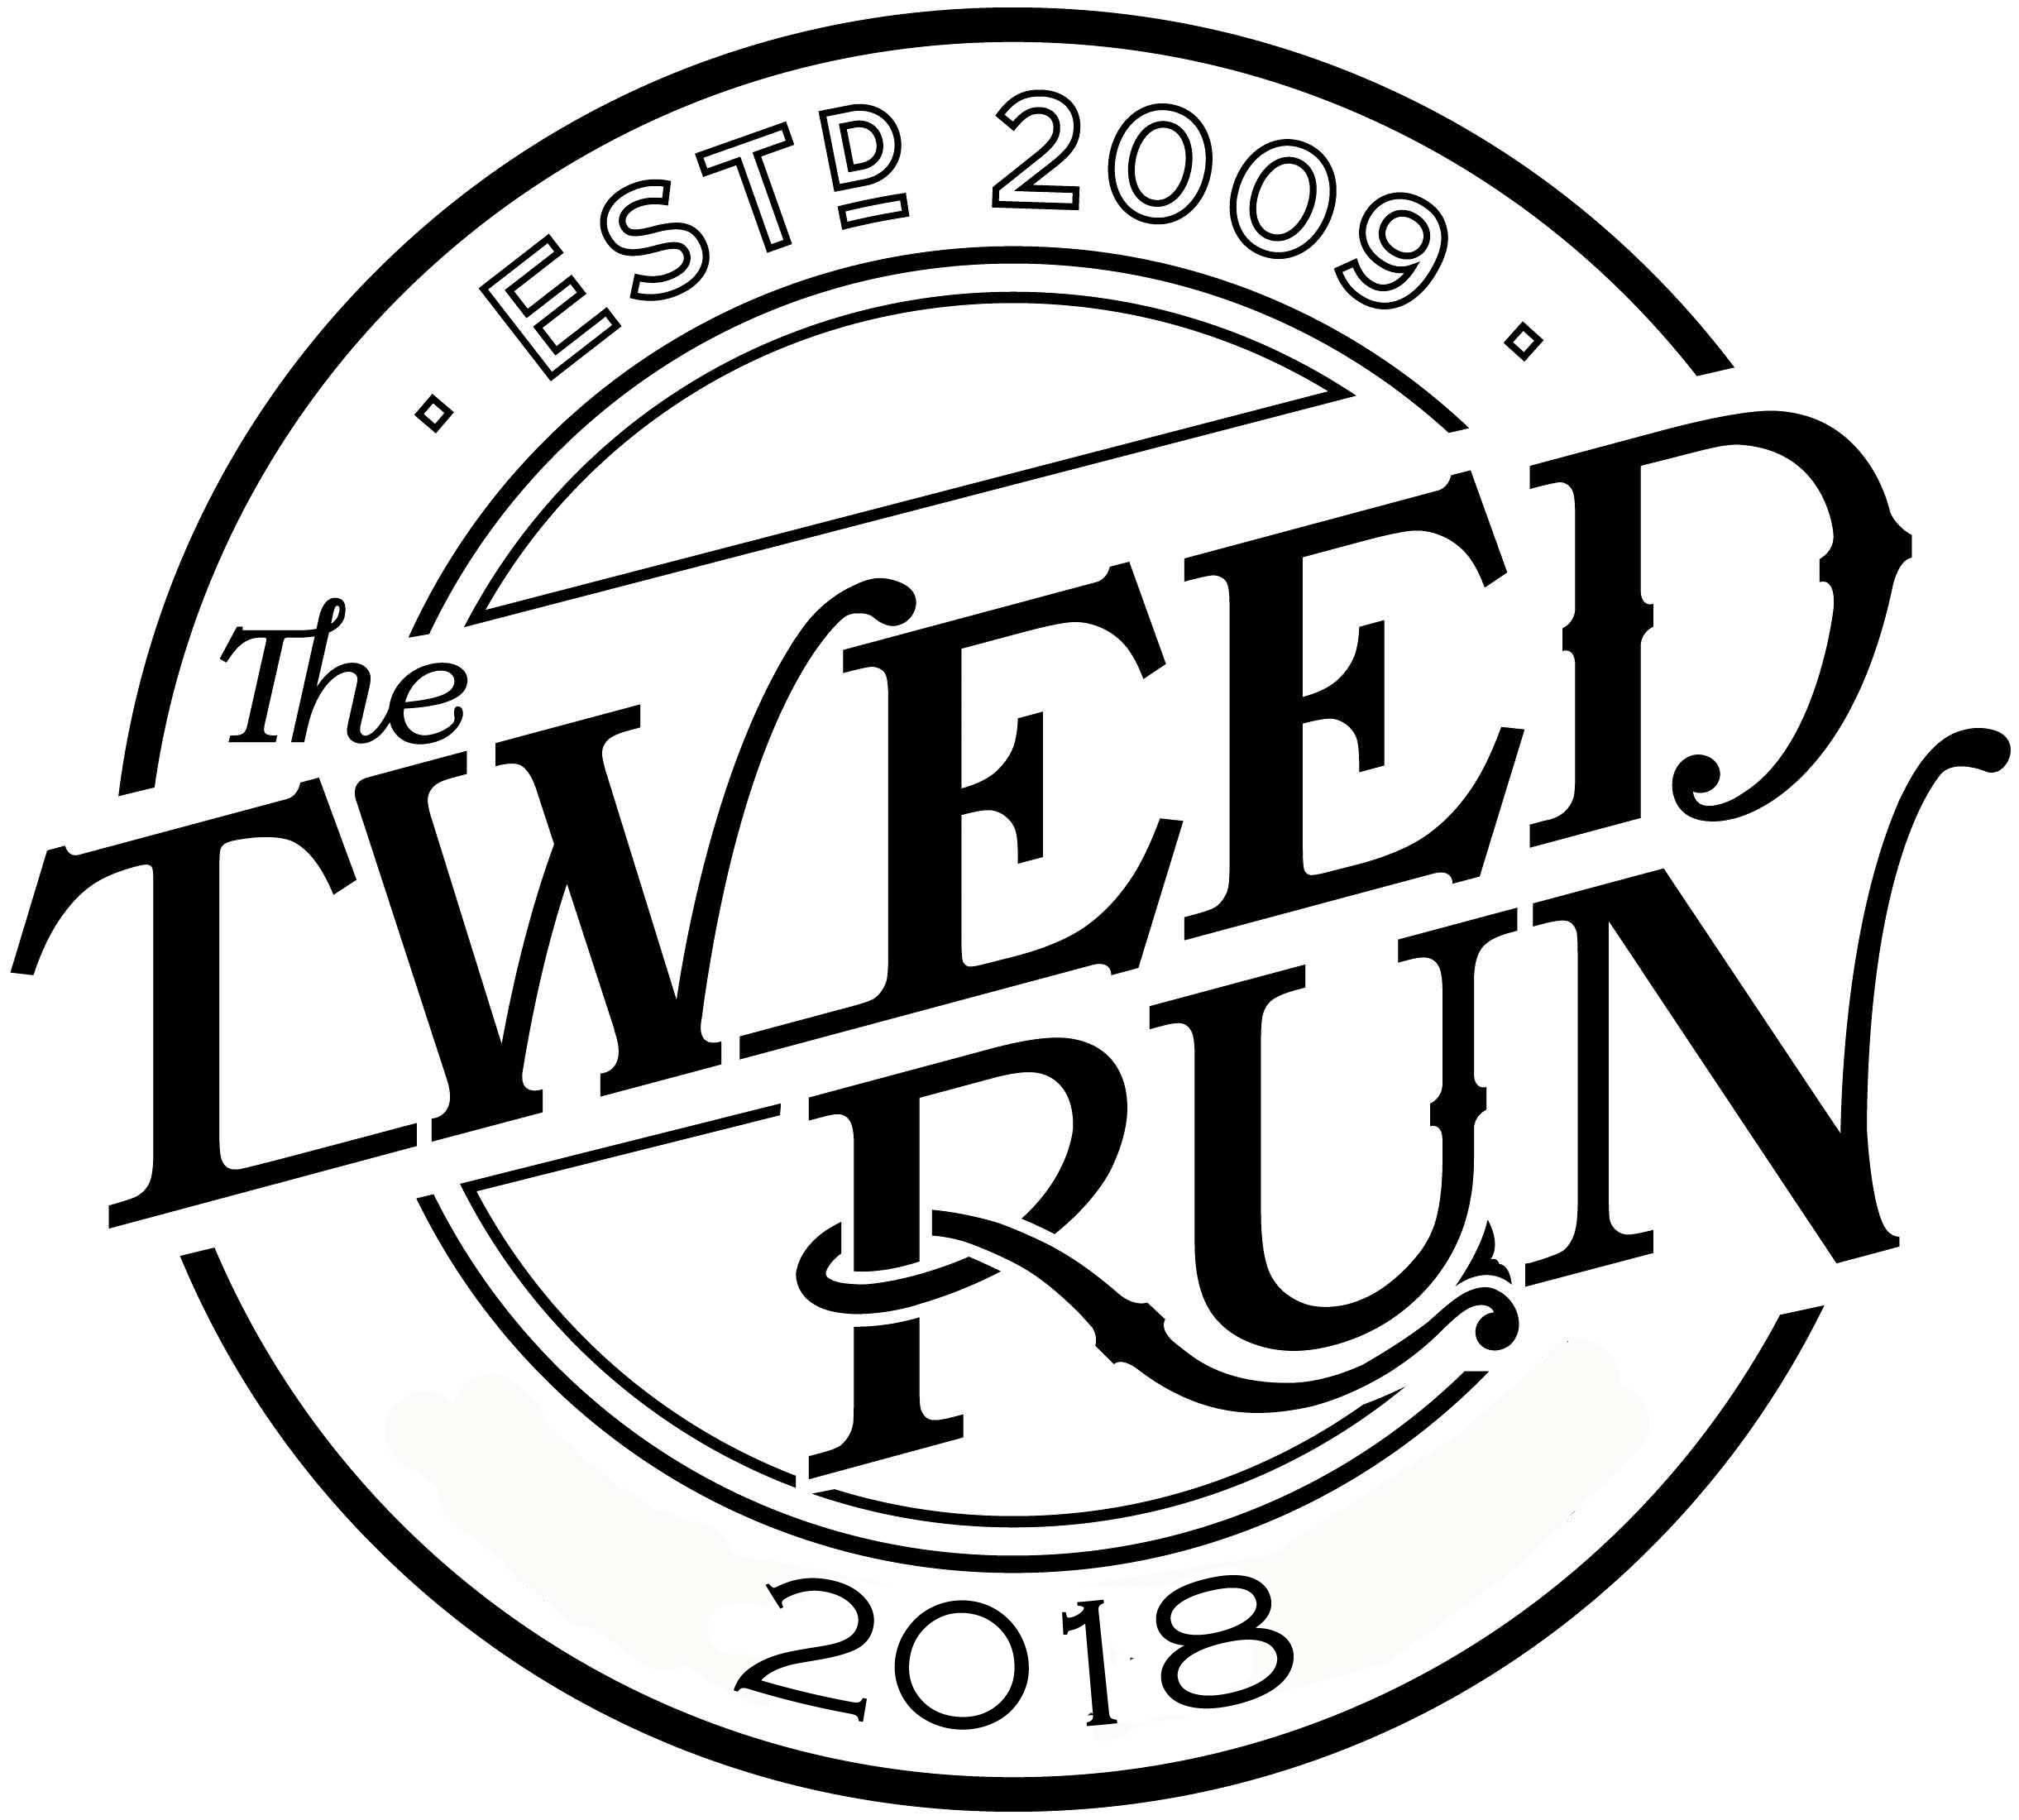 10th Anniversary Tweed Run Checklist